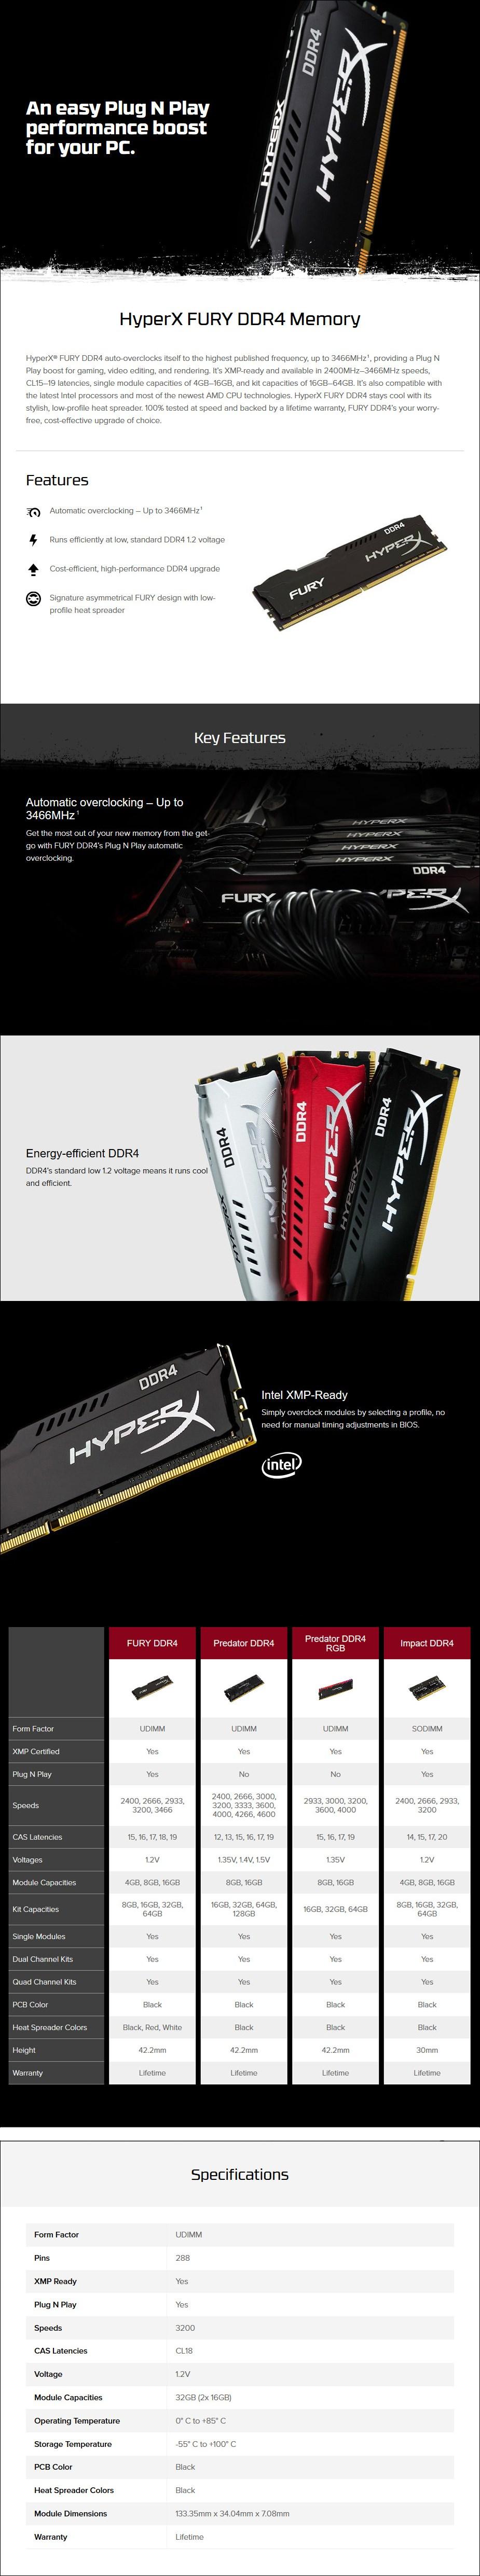 Kingston HyperX FURY 32GB (2x 16GB) DDR4 3200MHz Memory Black - Overview 1